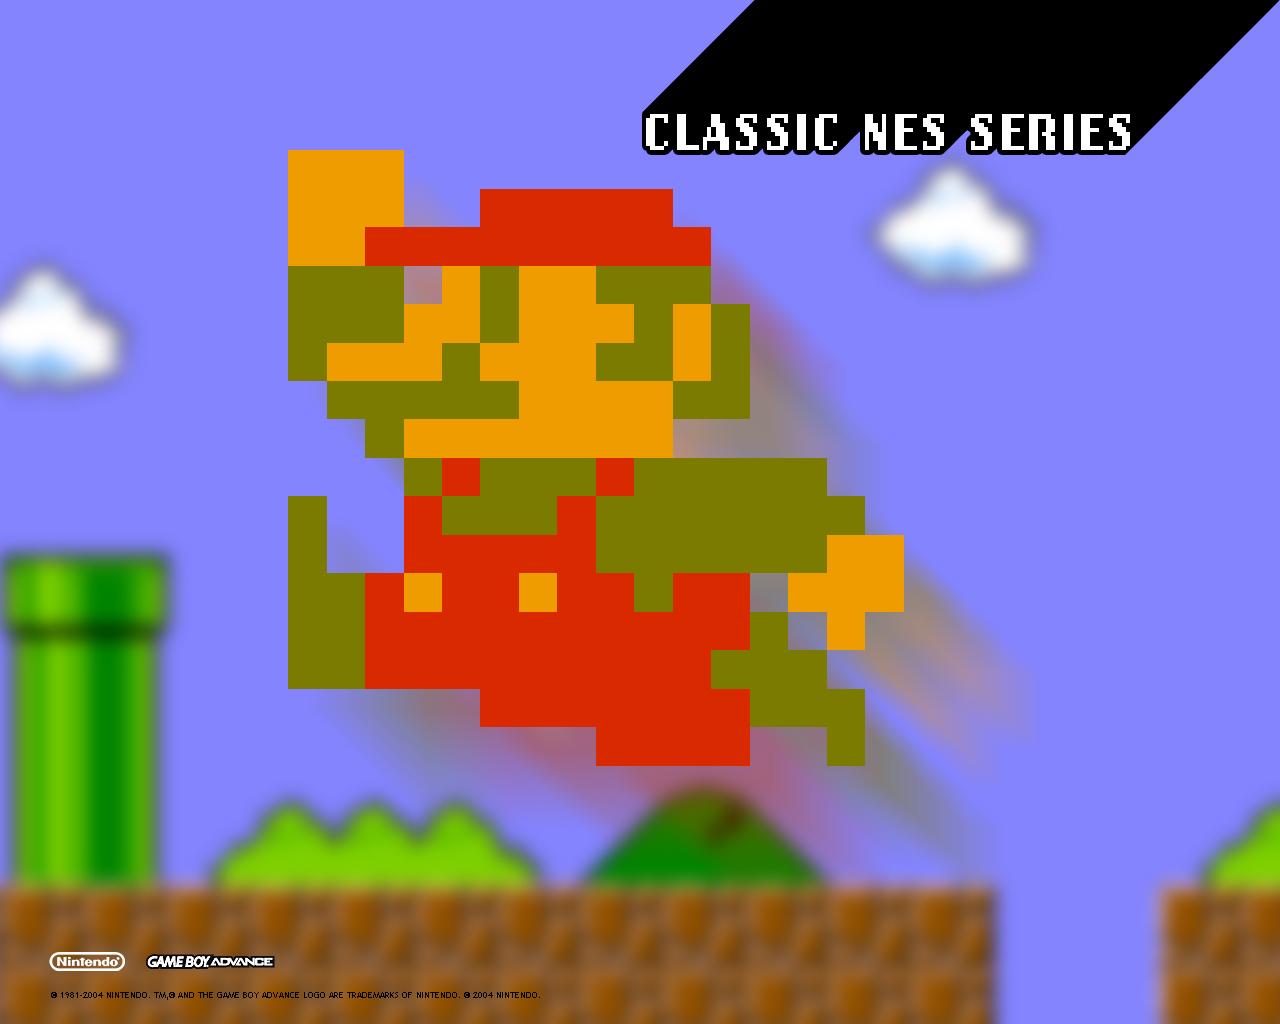 Mario wallpaper titled Classic NES Series: Super Mario Bros. wallpaper